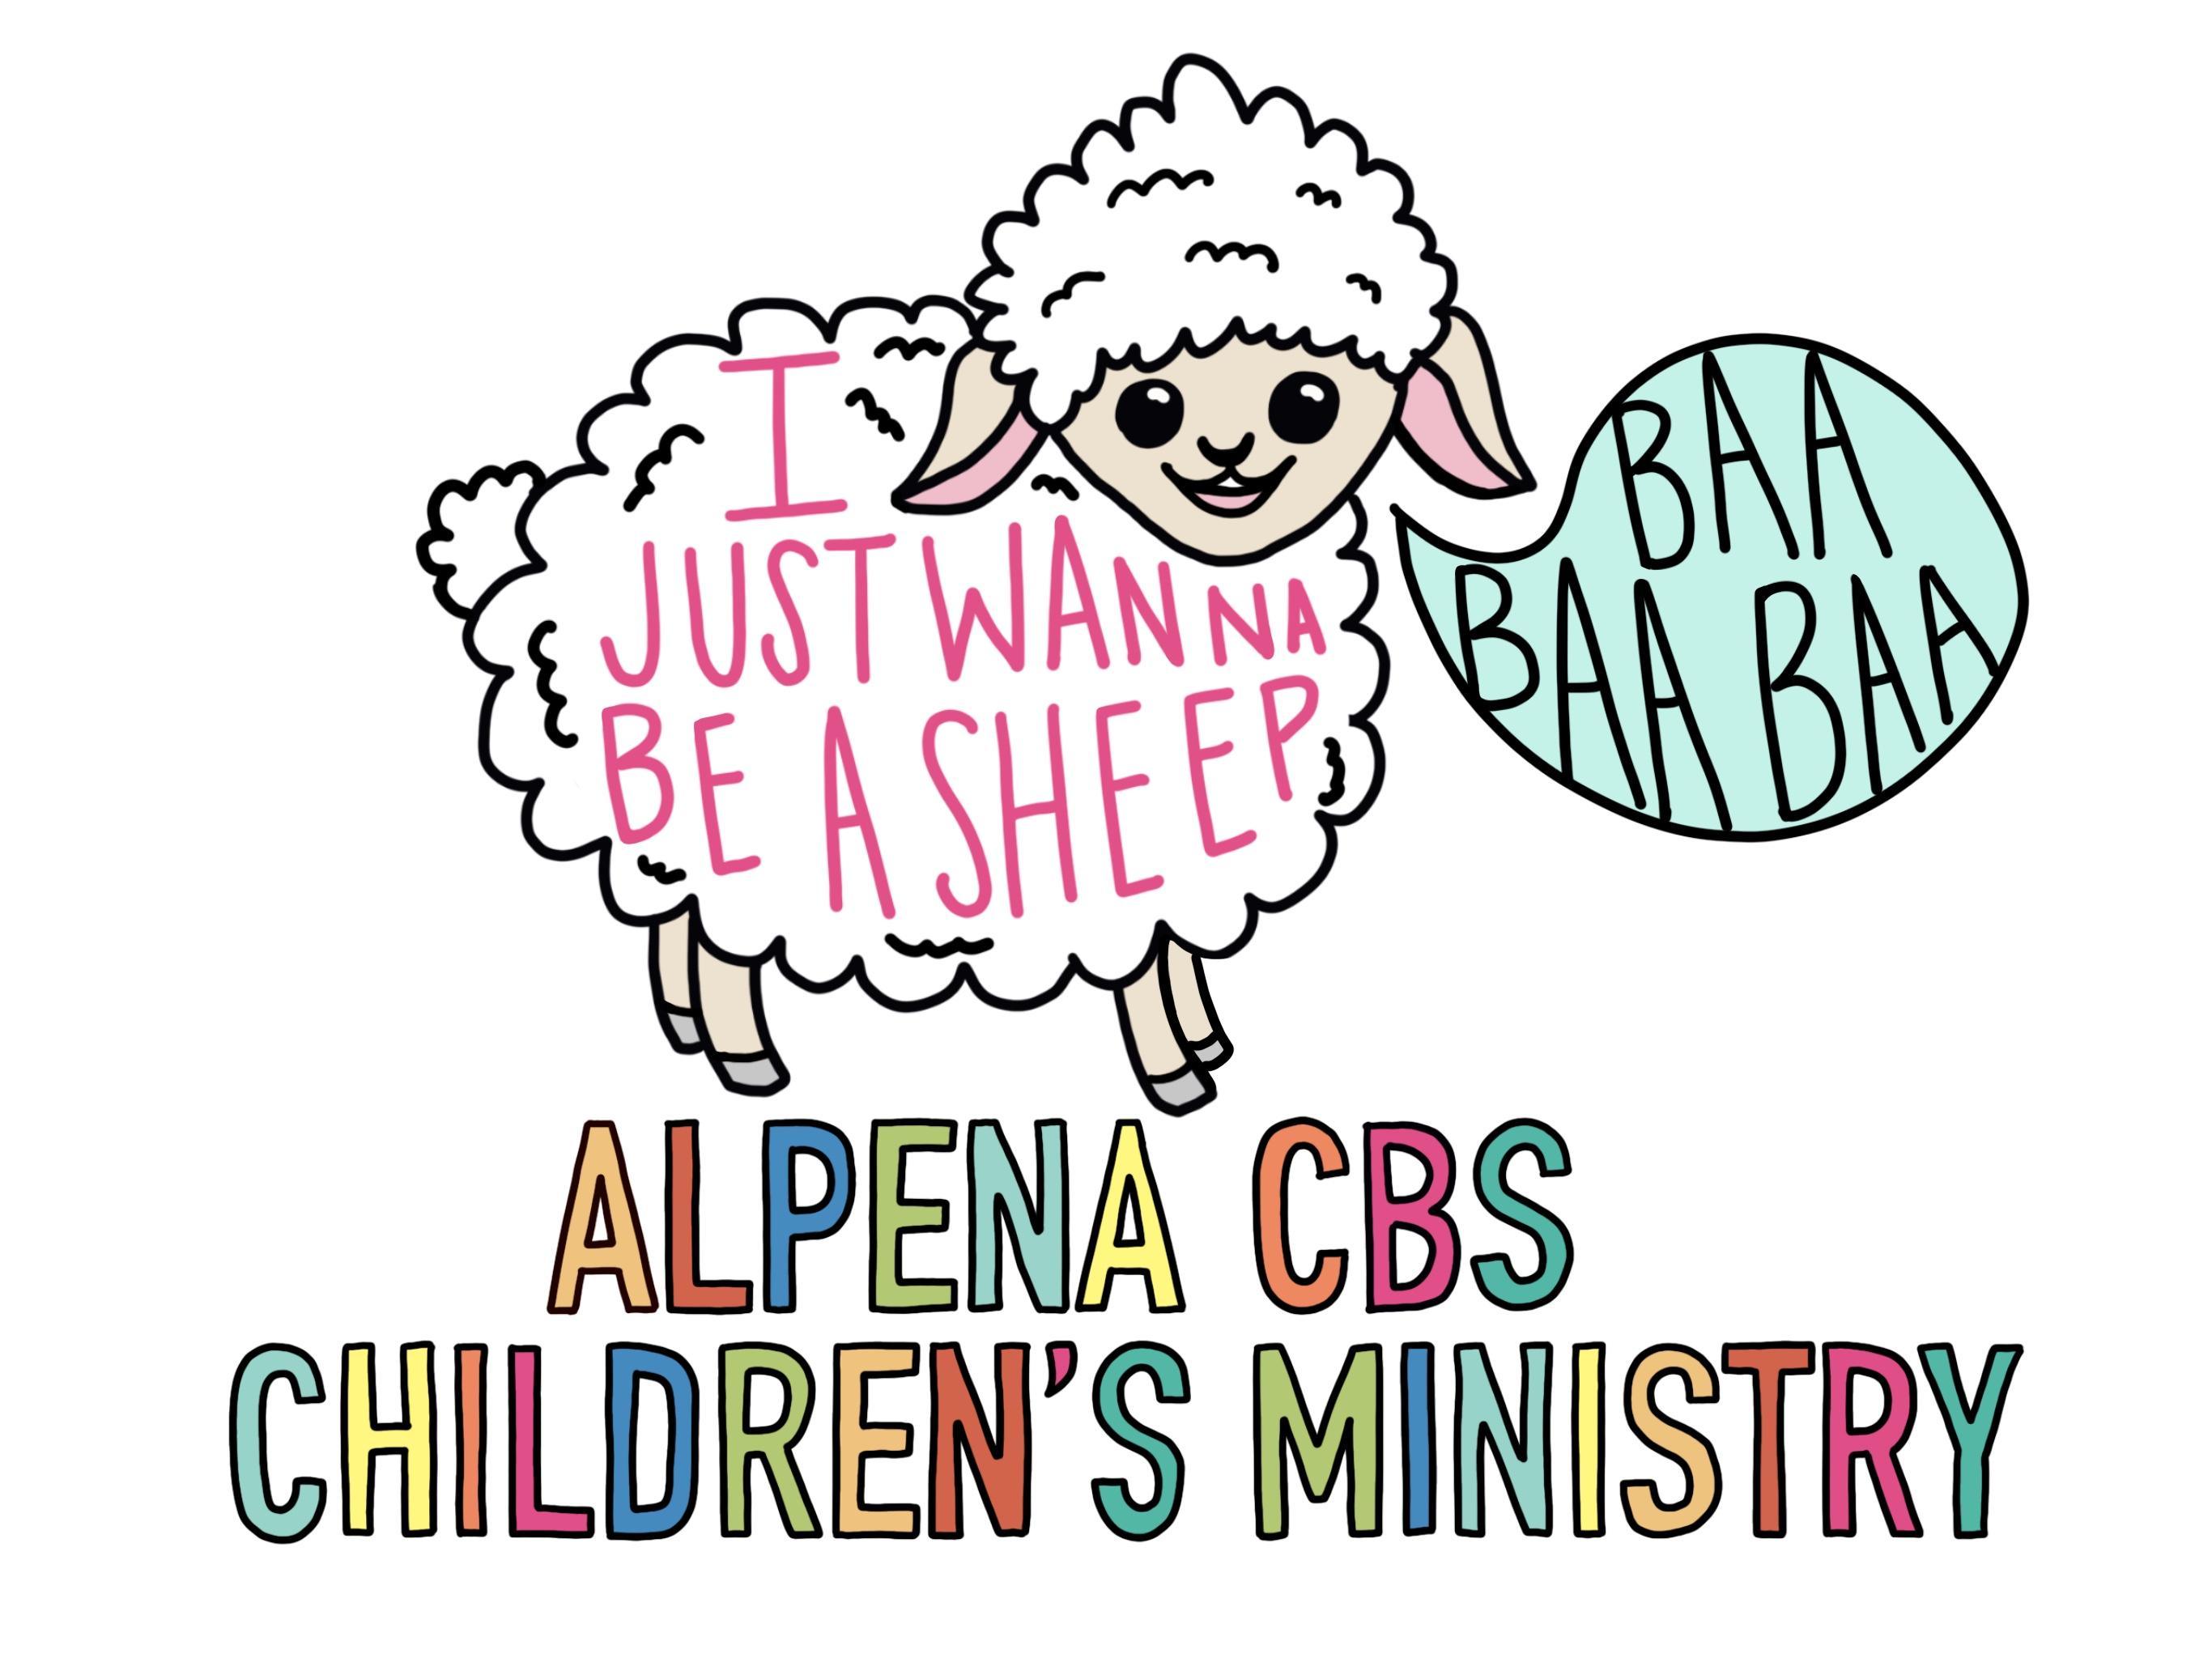 Alpena CBS Children's Ministry Logo